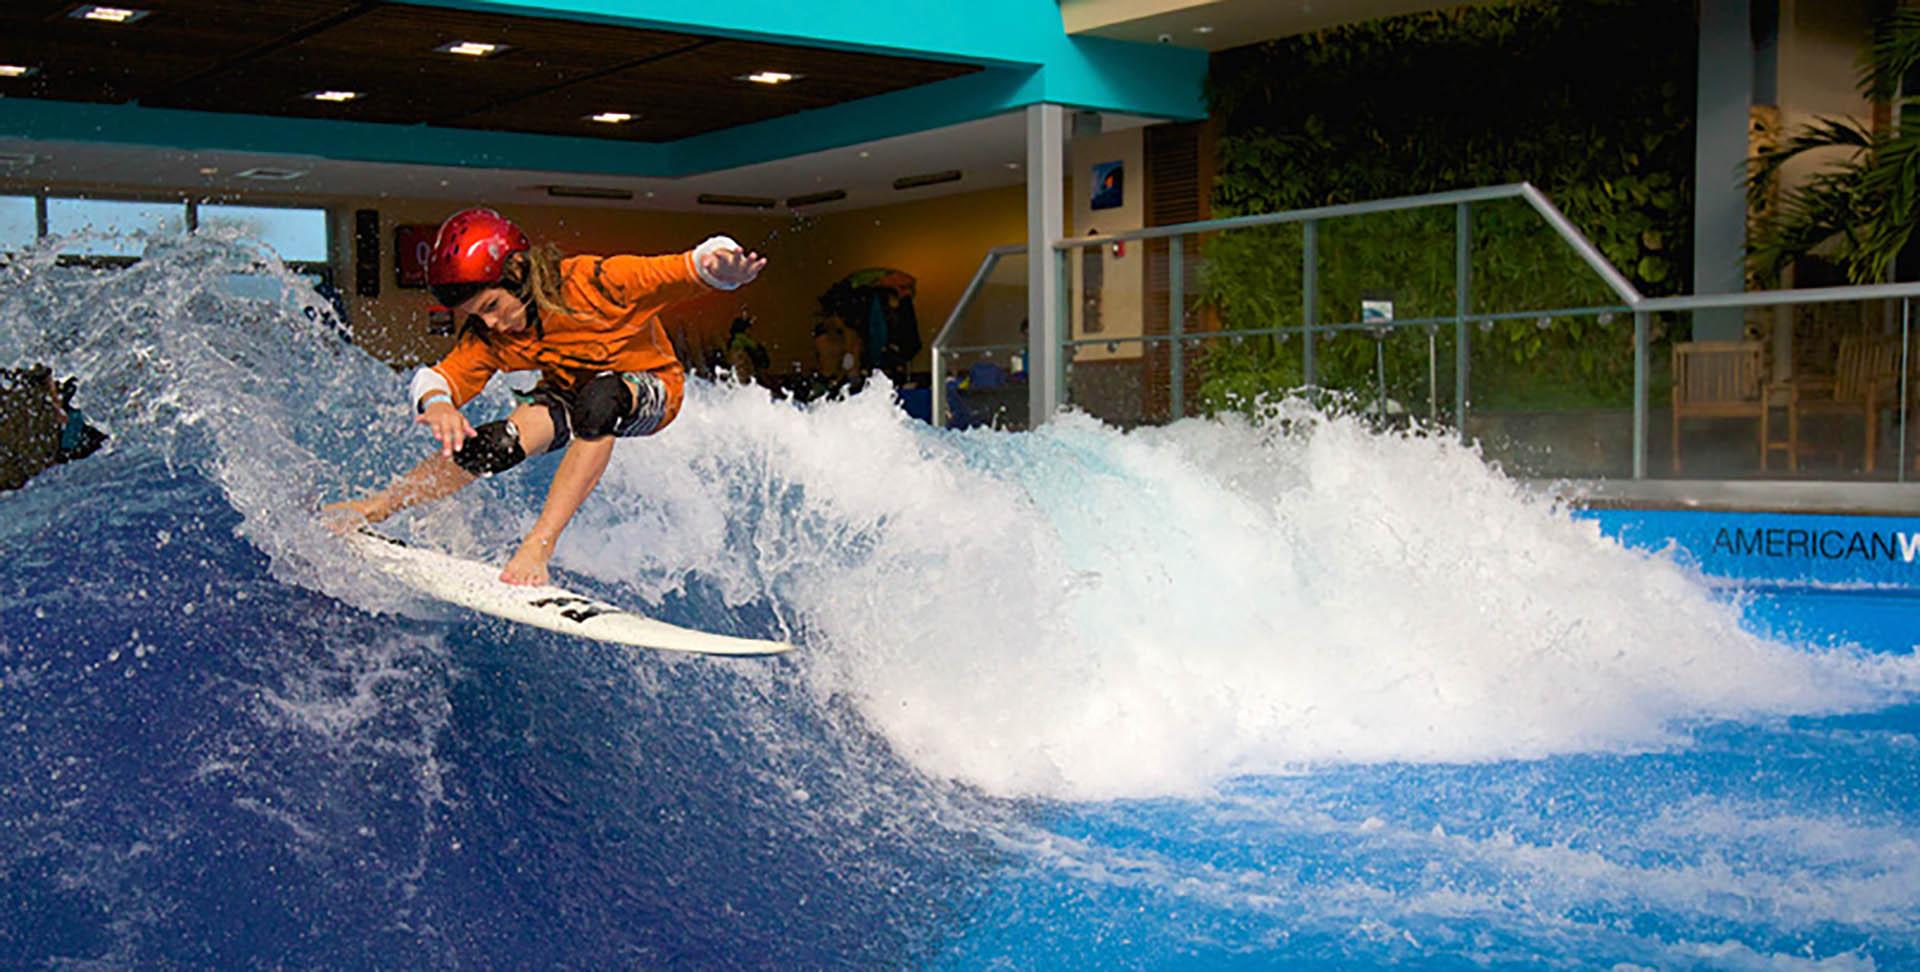 A Surfer On a Wave Inside The Surfhouse